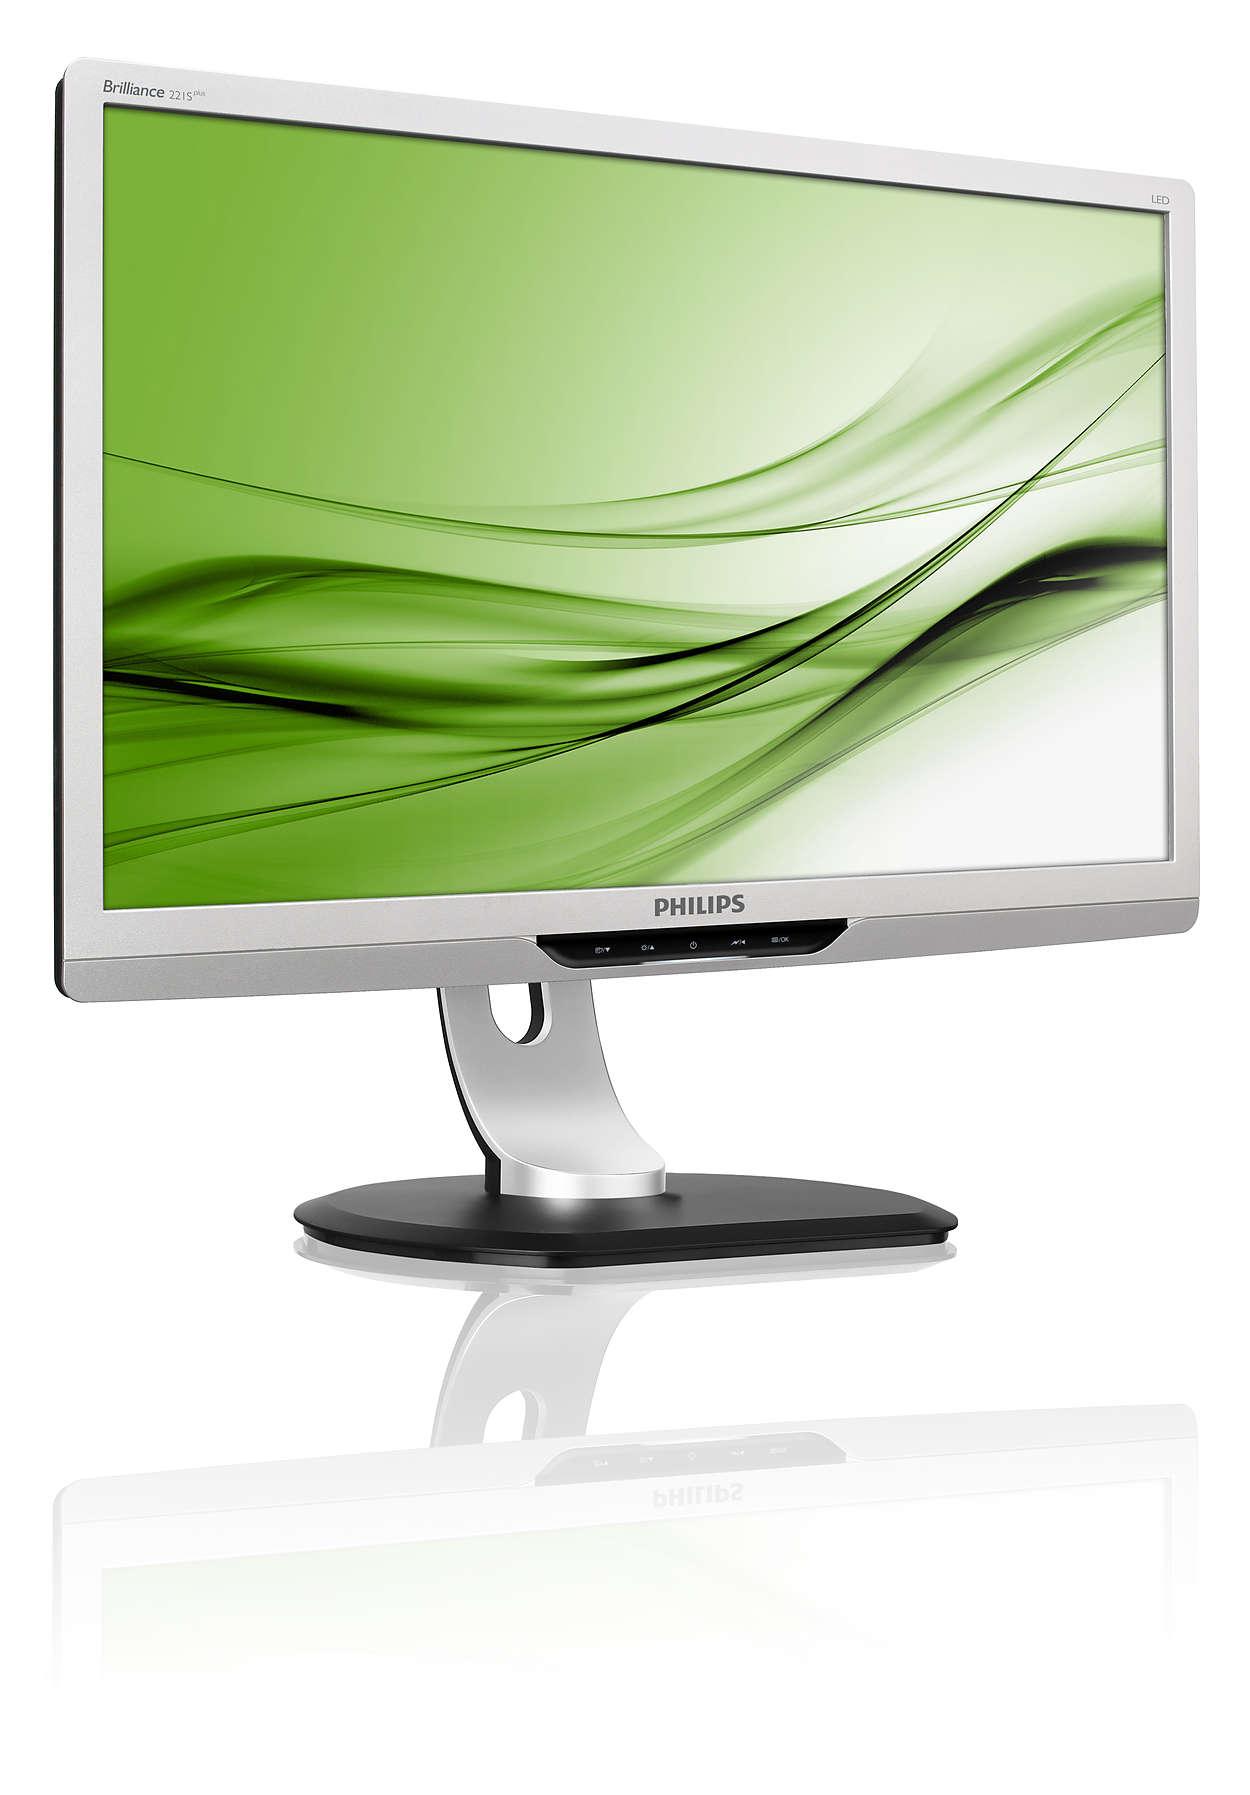 Productiviteitsverhogende ergonomische monitor